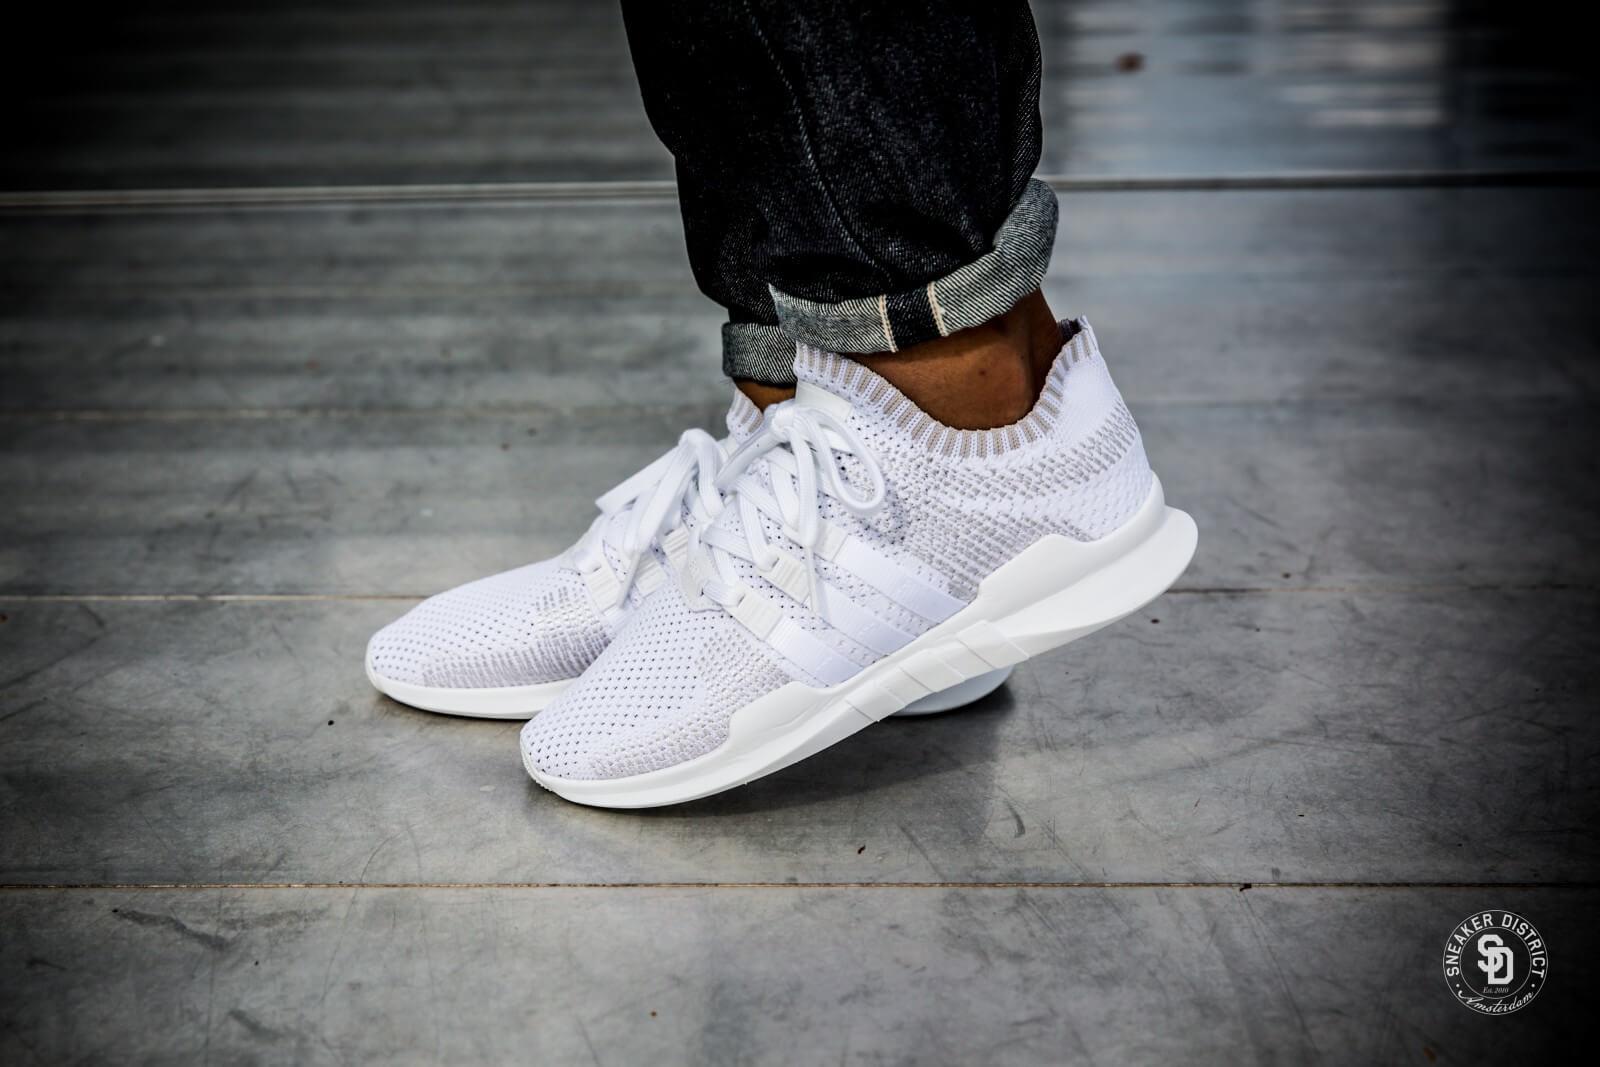 Adidas EQT Support ADV PK Footwear White / Footwear White / Sub Green